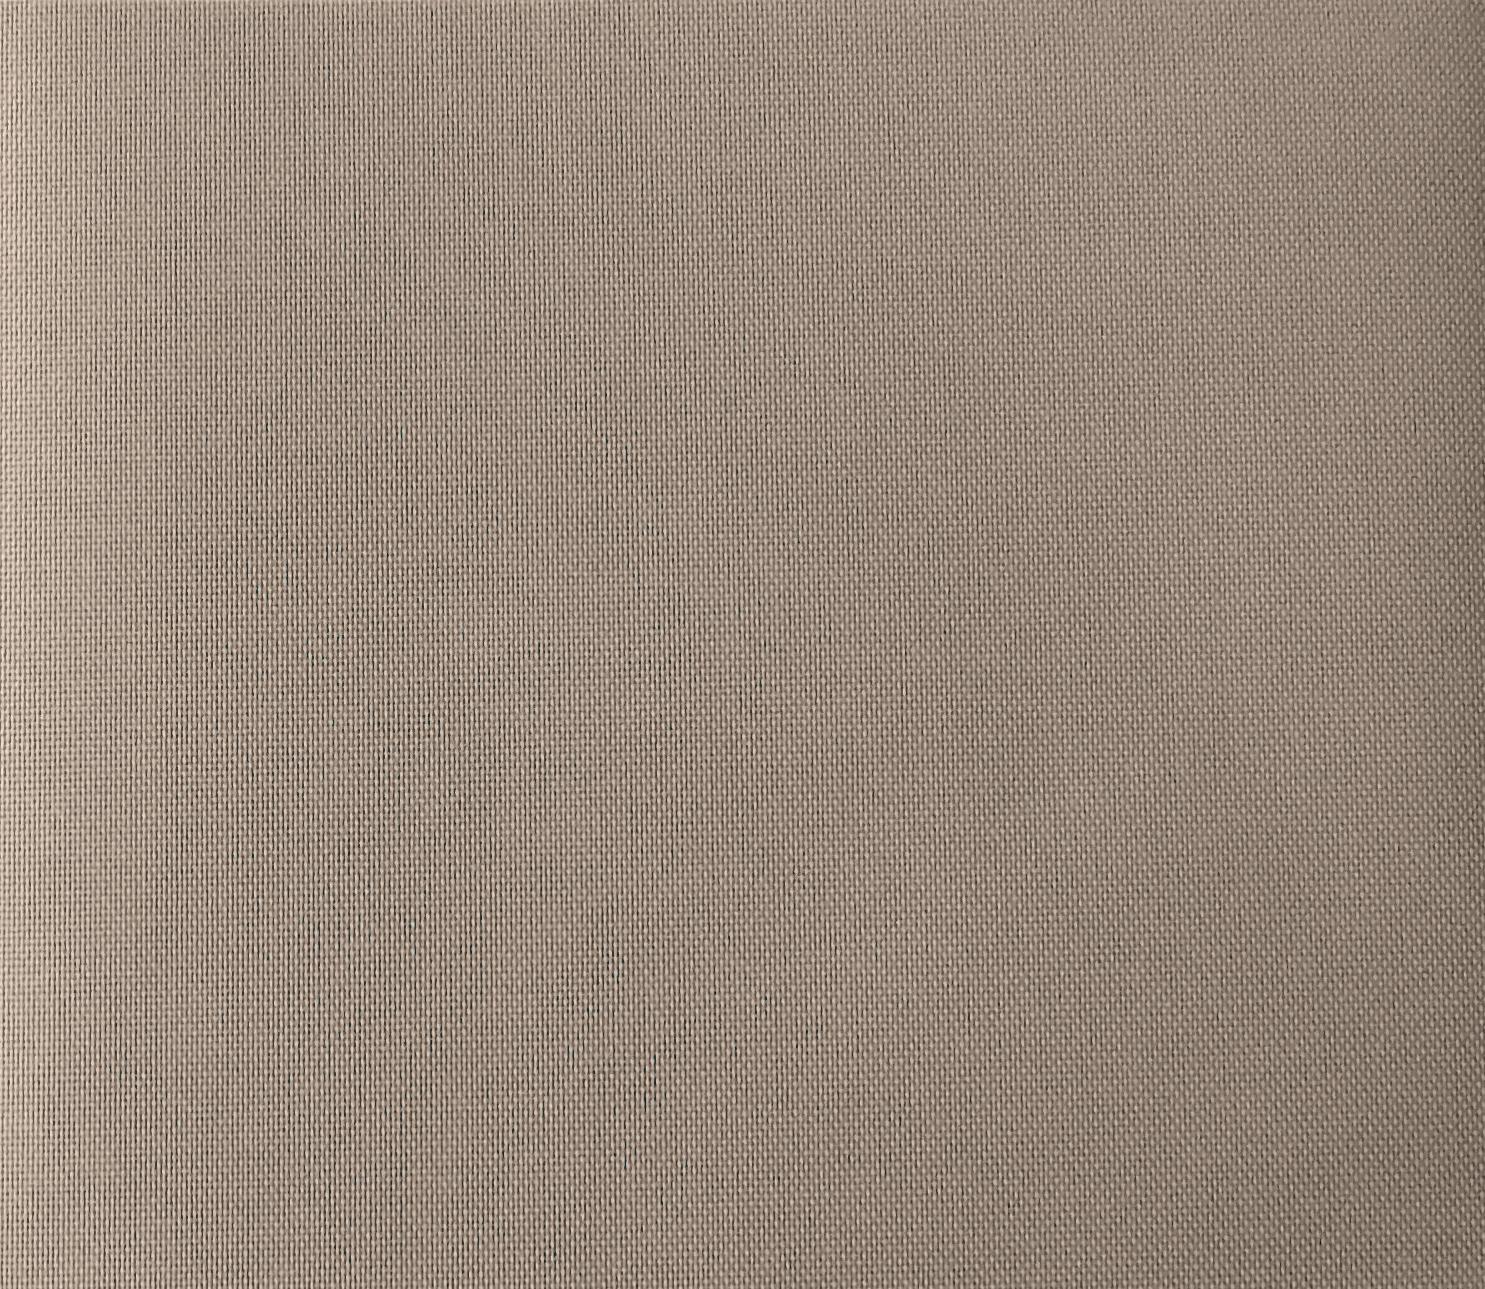 Velux 4574 Skylight Blind fabric